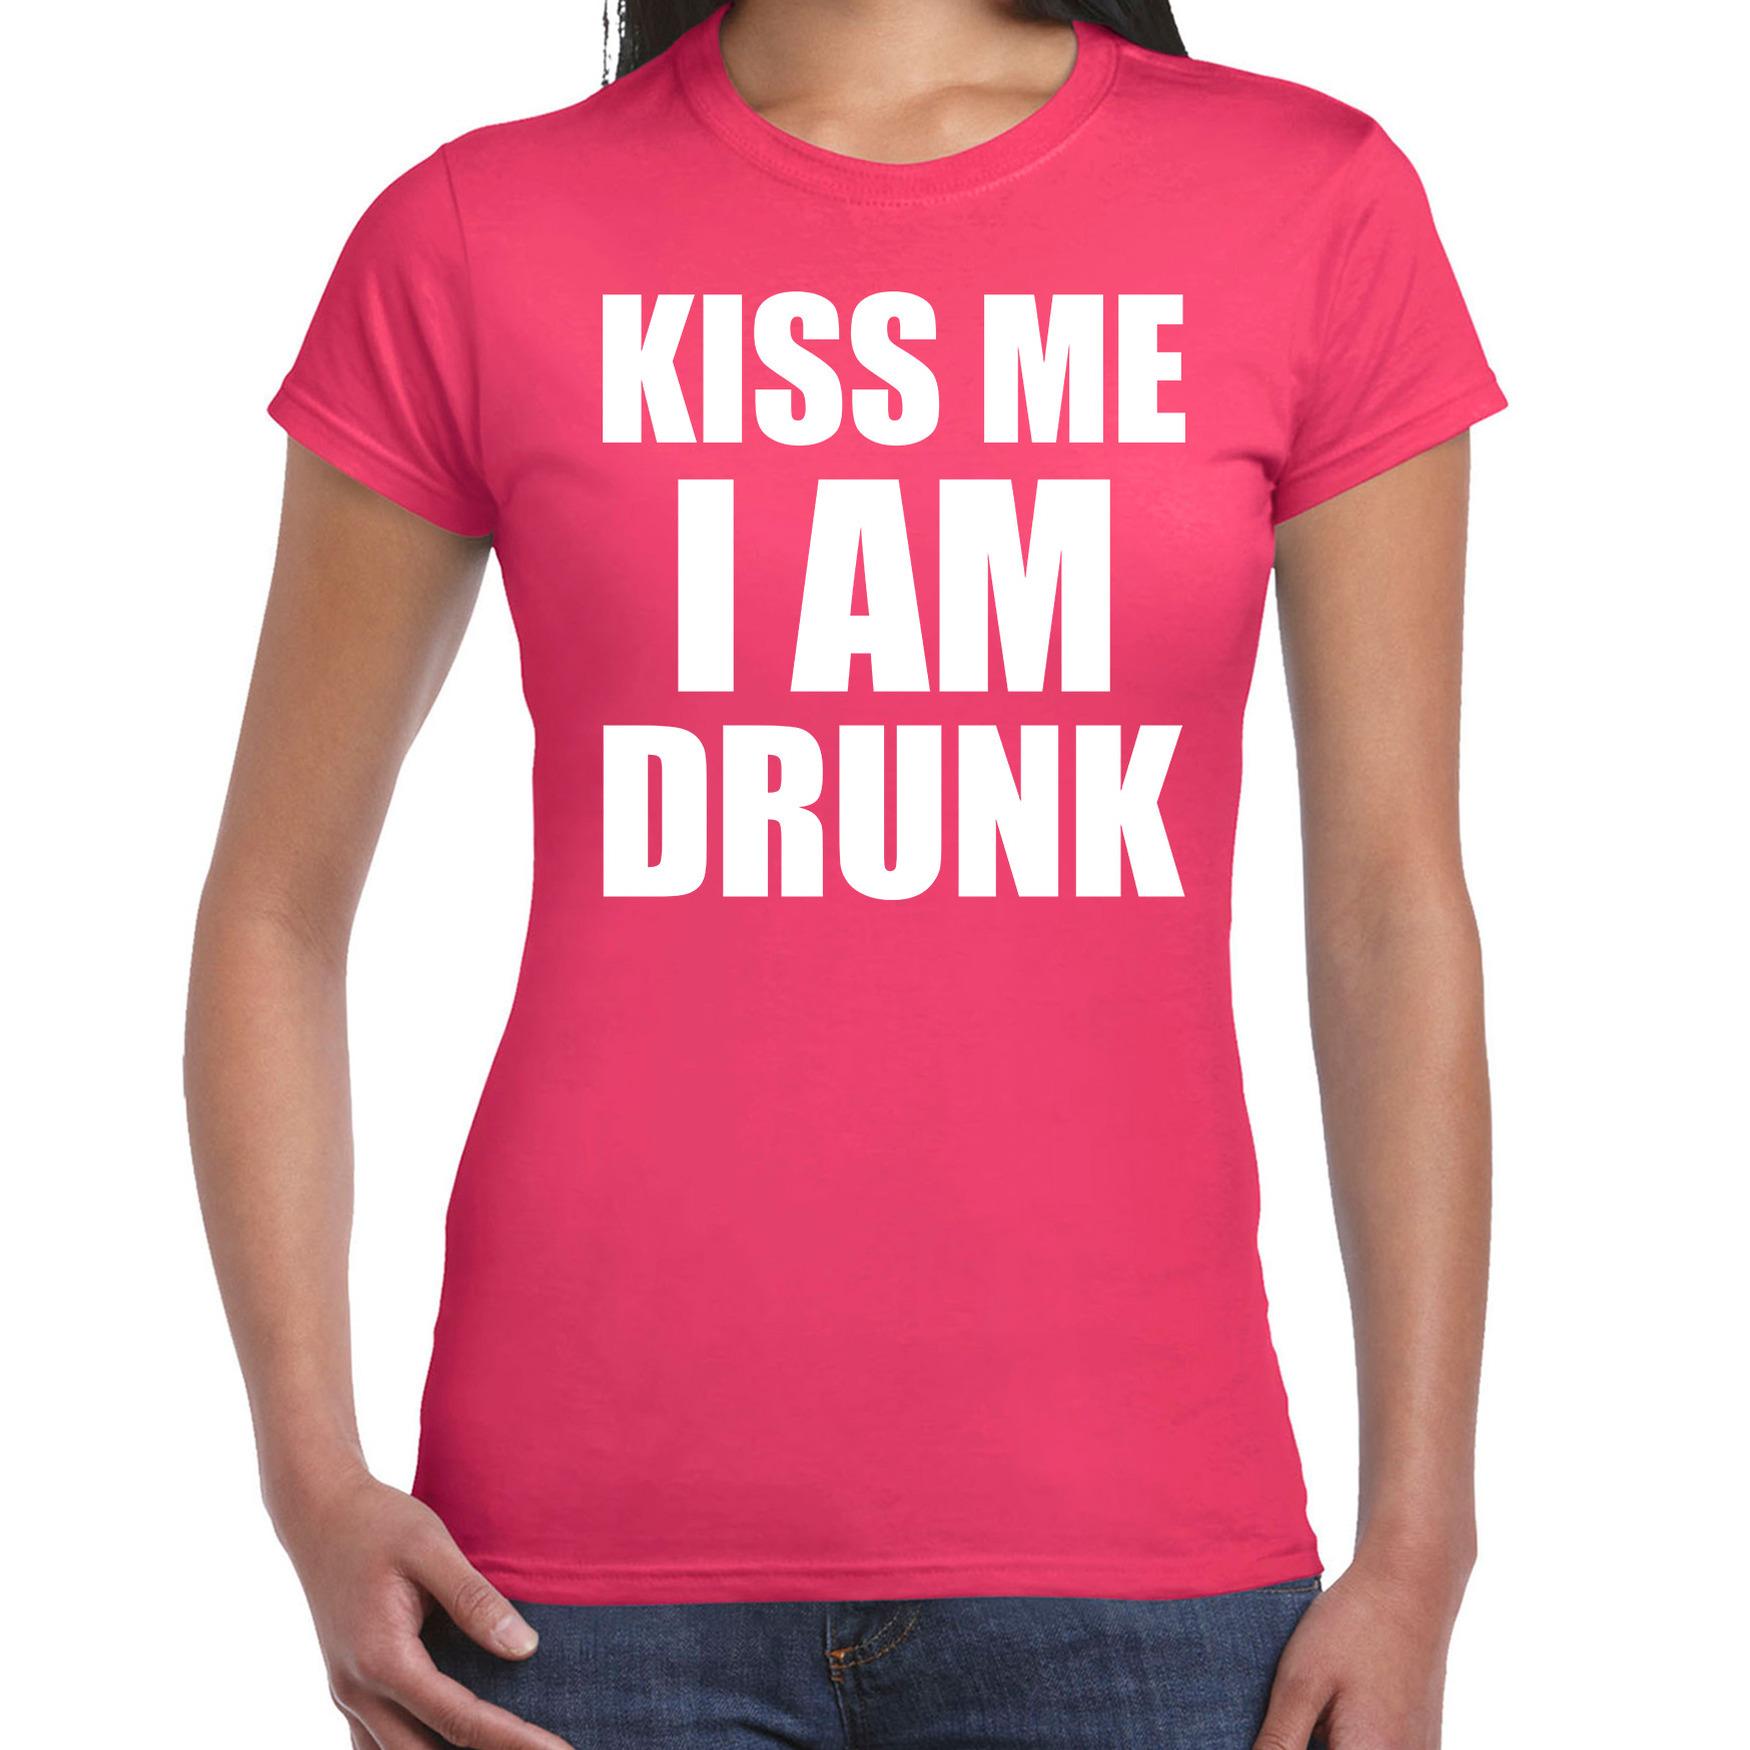 Fun t-shirt kiss me I am drunk roze voor dames M -